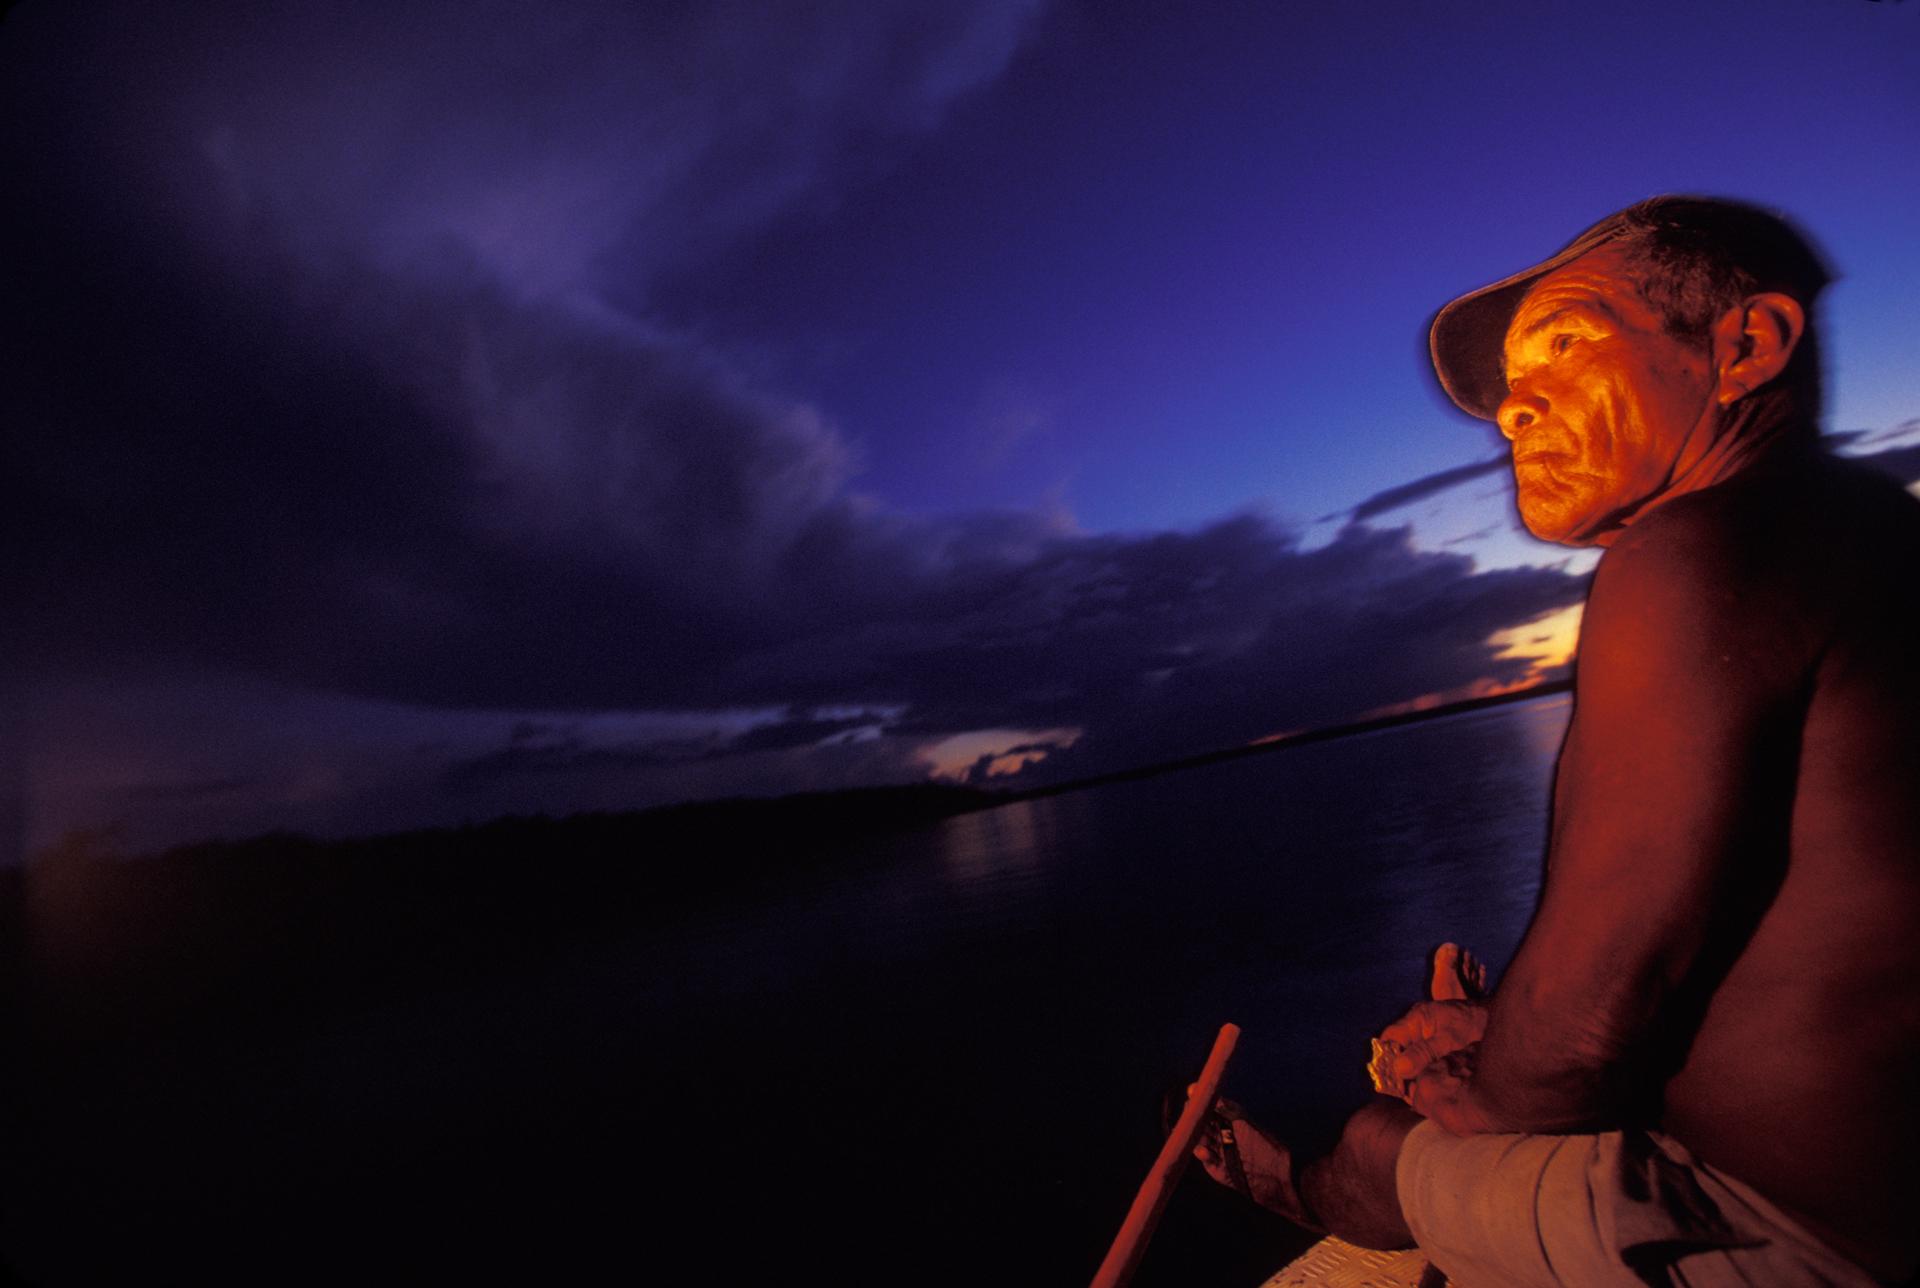 Watching the moonrise from a boat on the Rio Canuma near Niteroi in Kwata-Laranjal.  Niteroi, Brazil